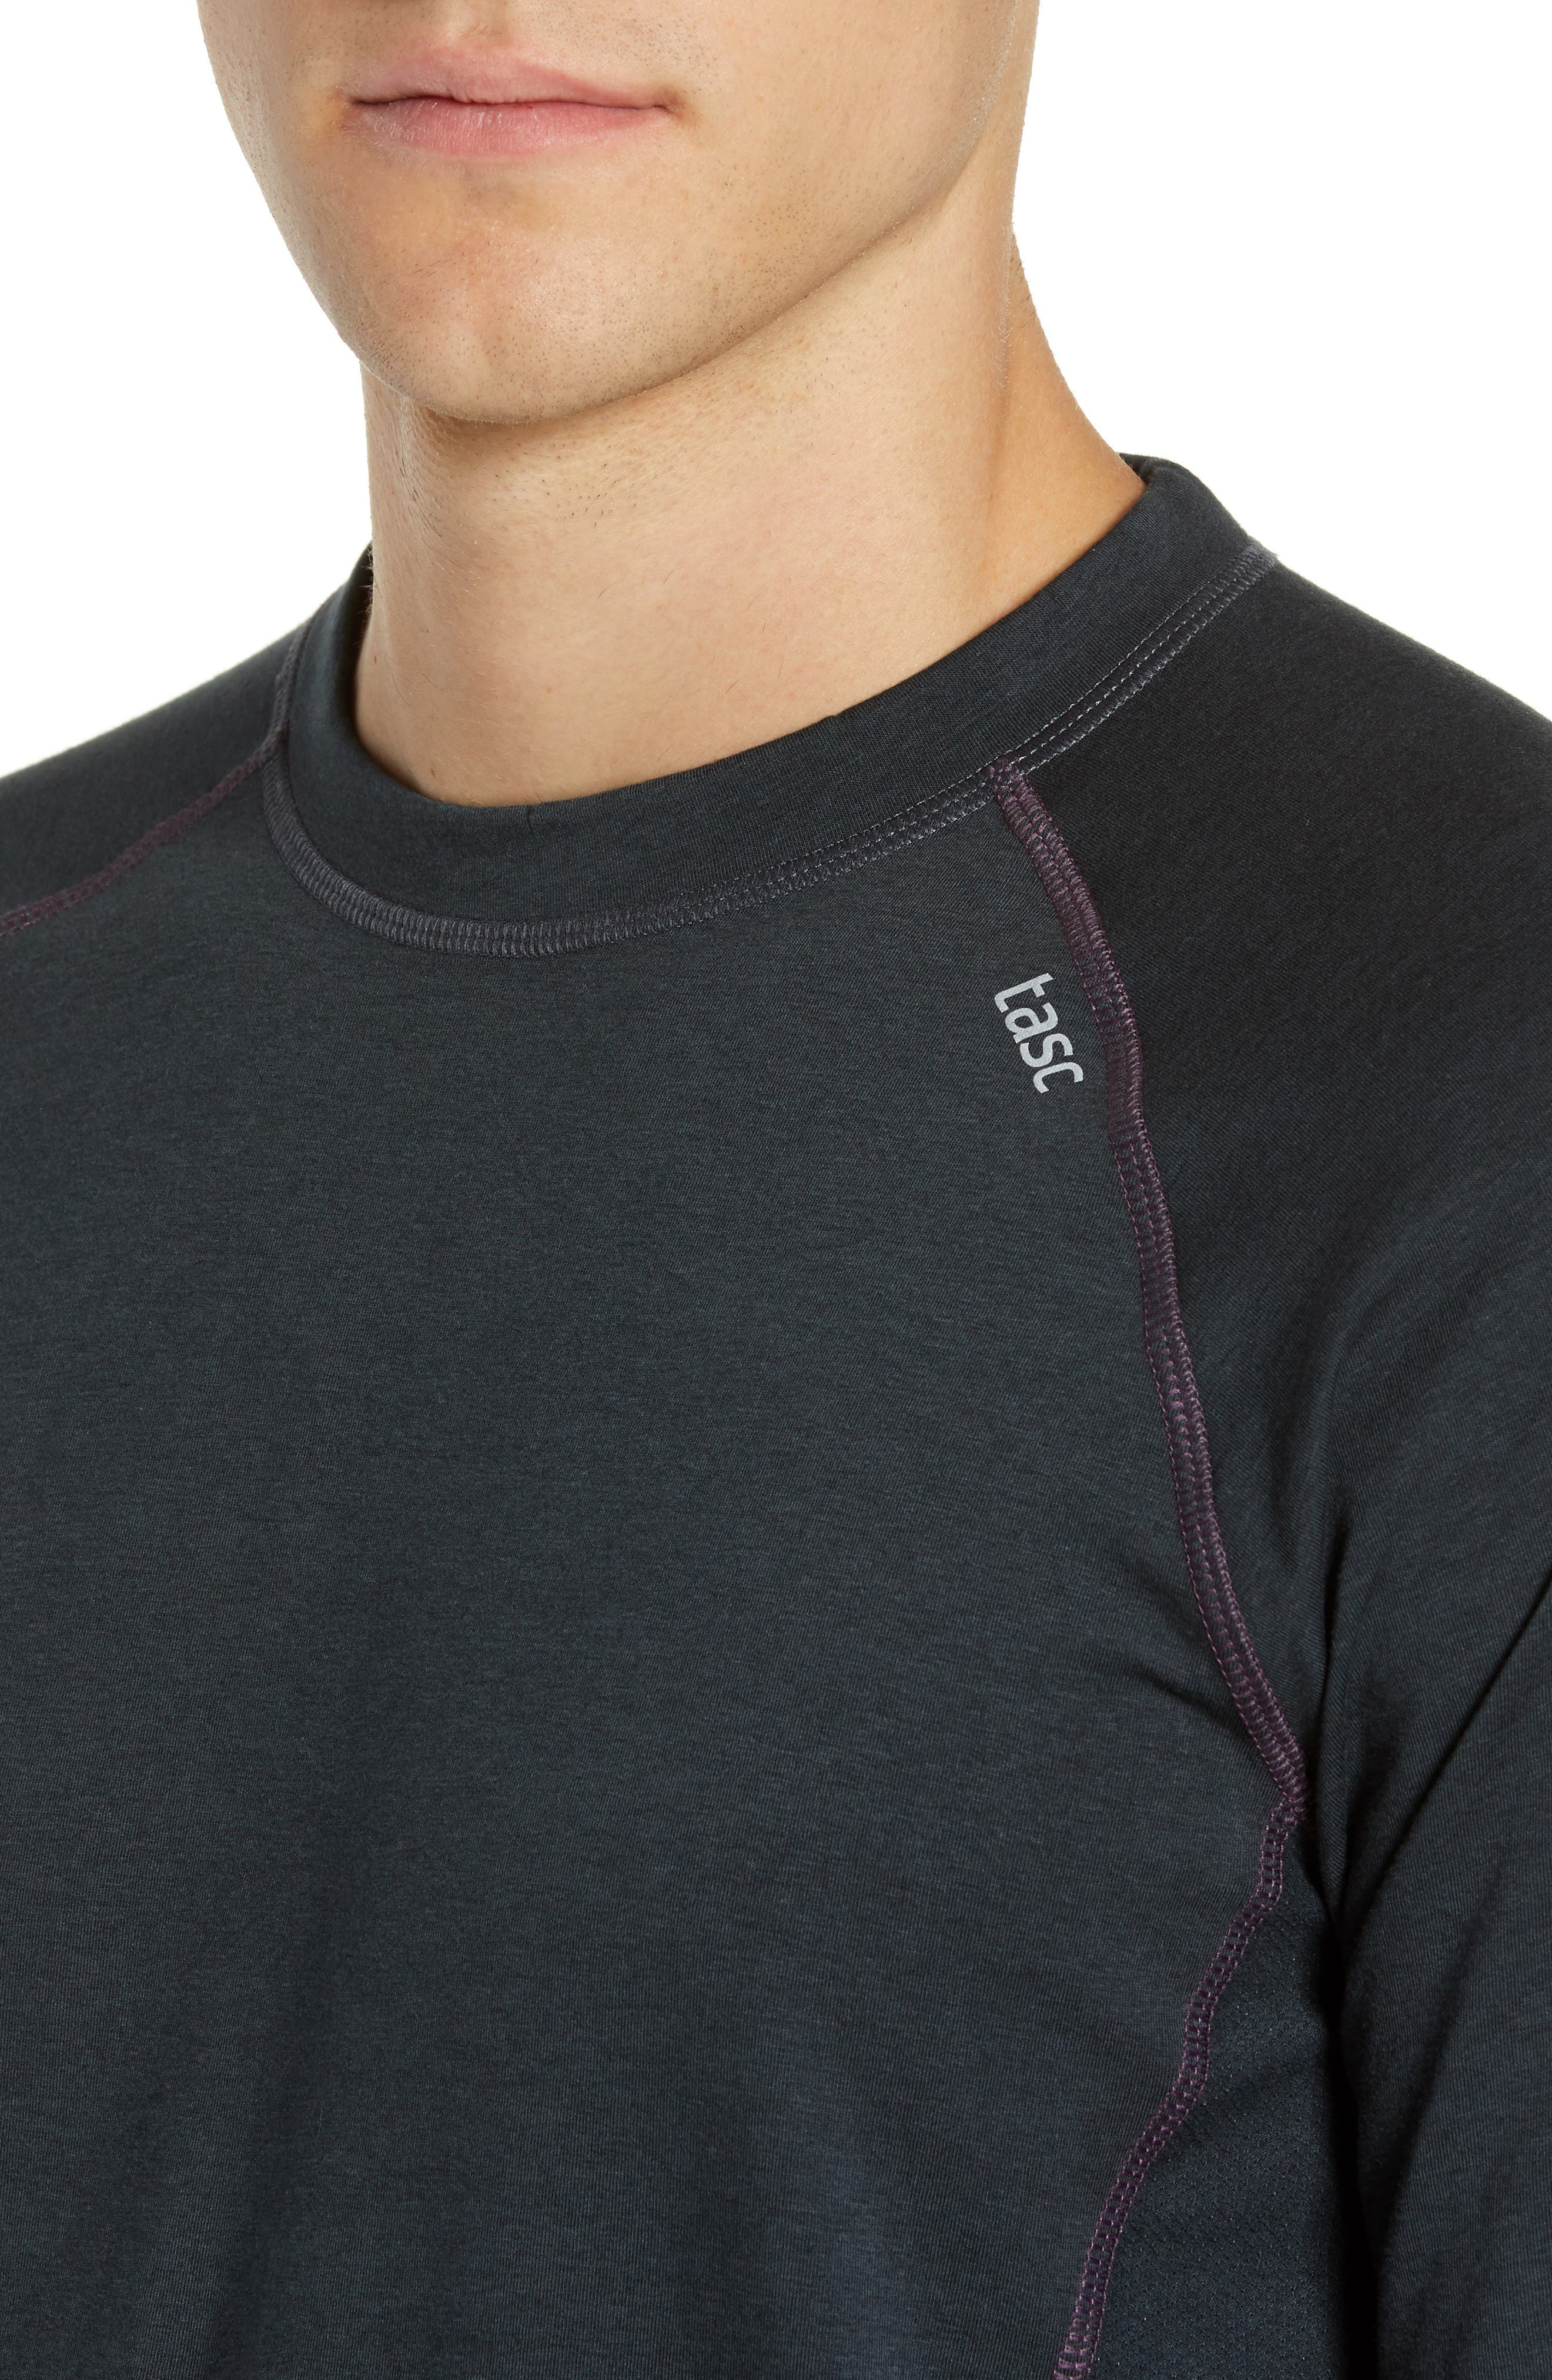 Charge II Long Sleeve T-Shirt,                             Alternate thumbnail 4, color,                             GUNMETAL/ ECLIPSE